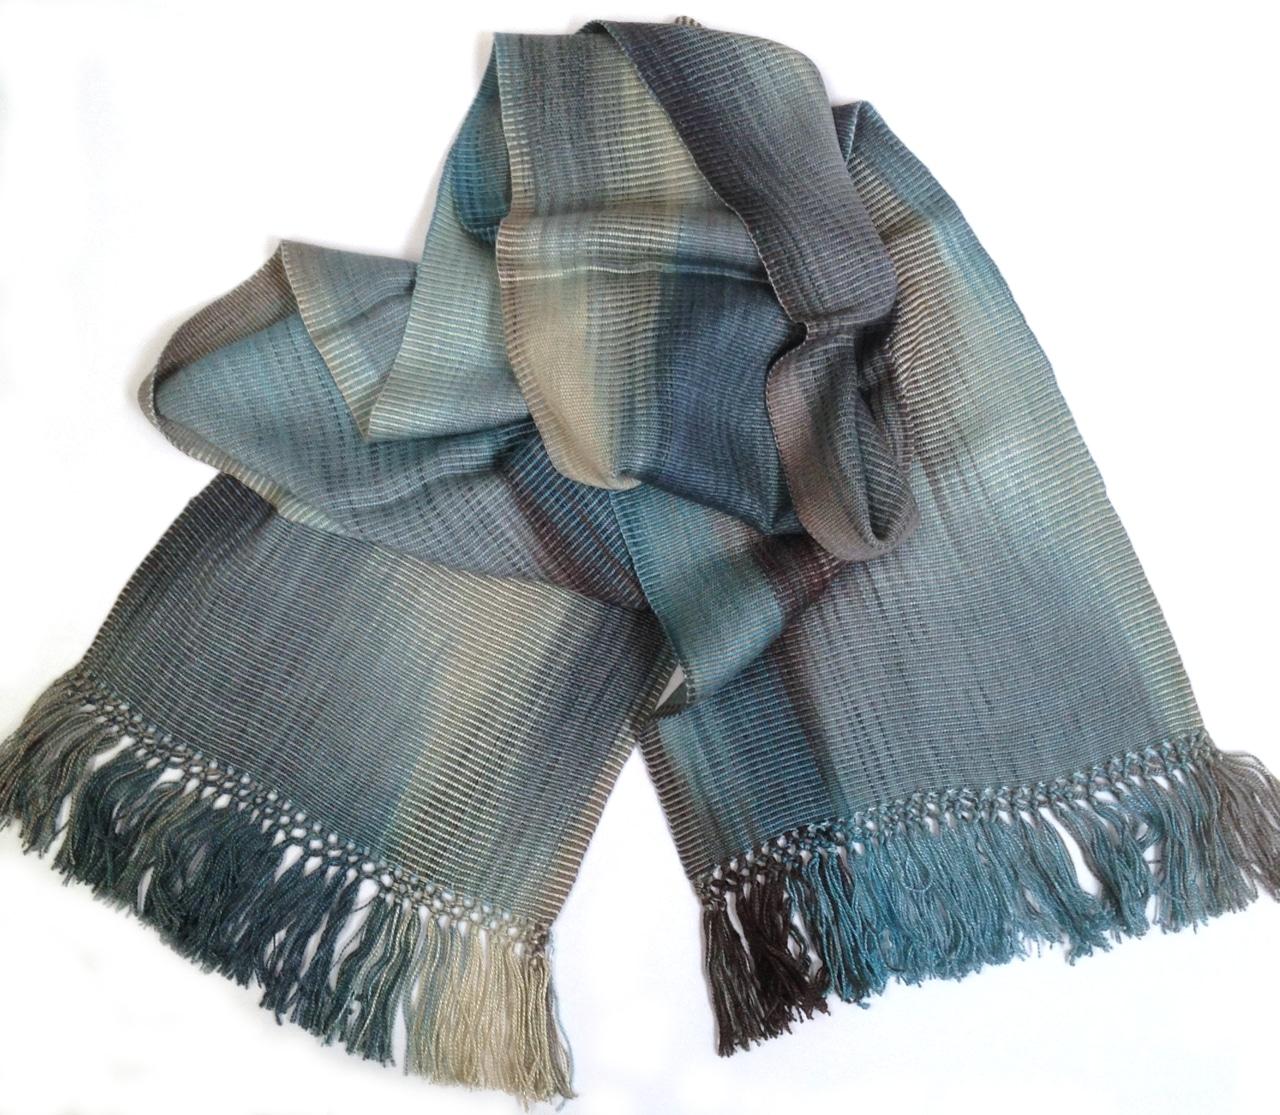 Denim (Blue, Black, Cream, Gray) - Lightweight Bamboo Handwoven Scarf 8 x 68